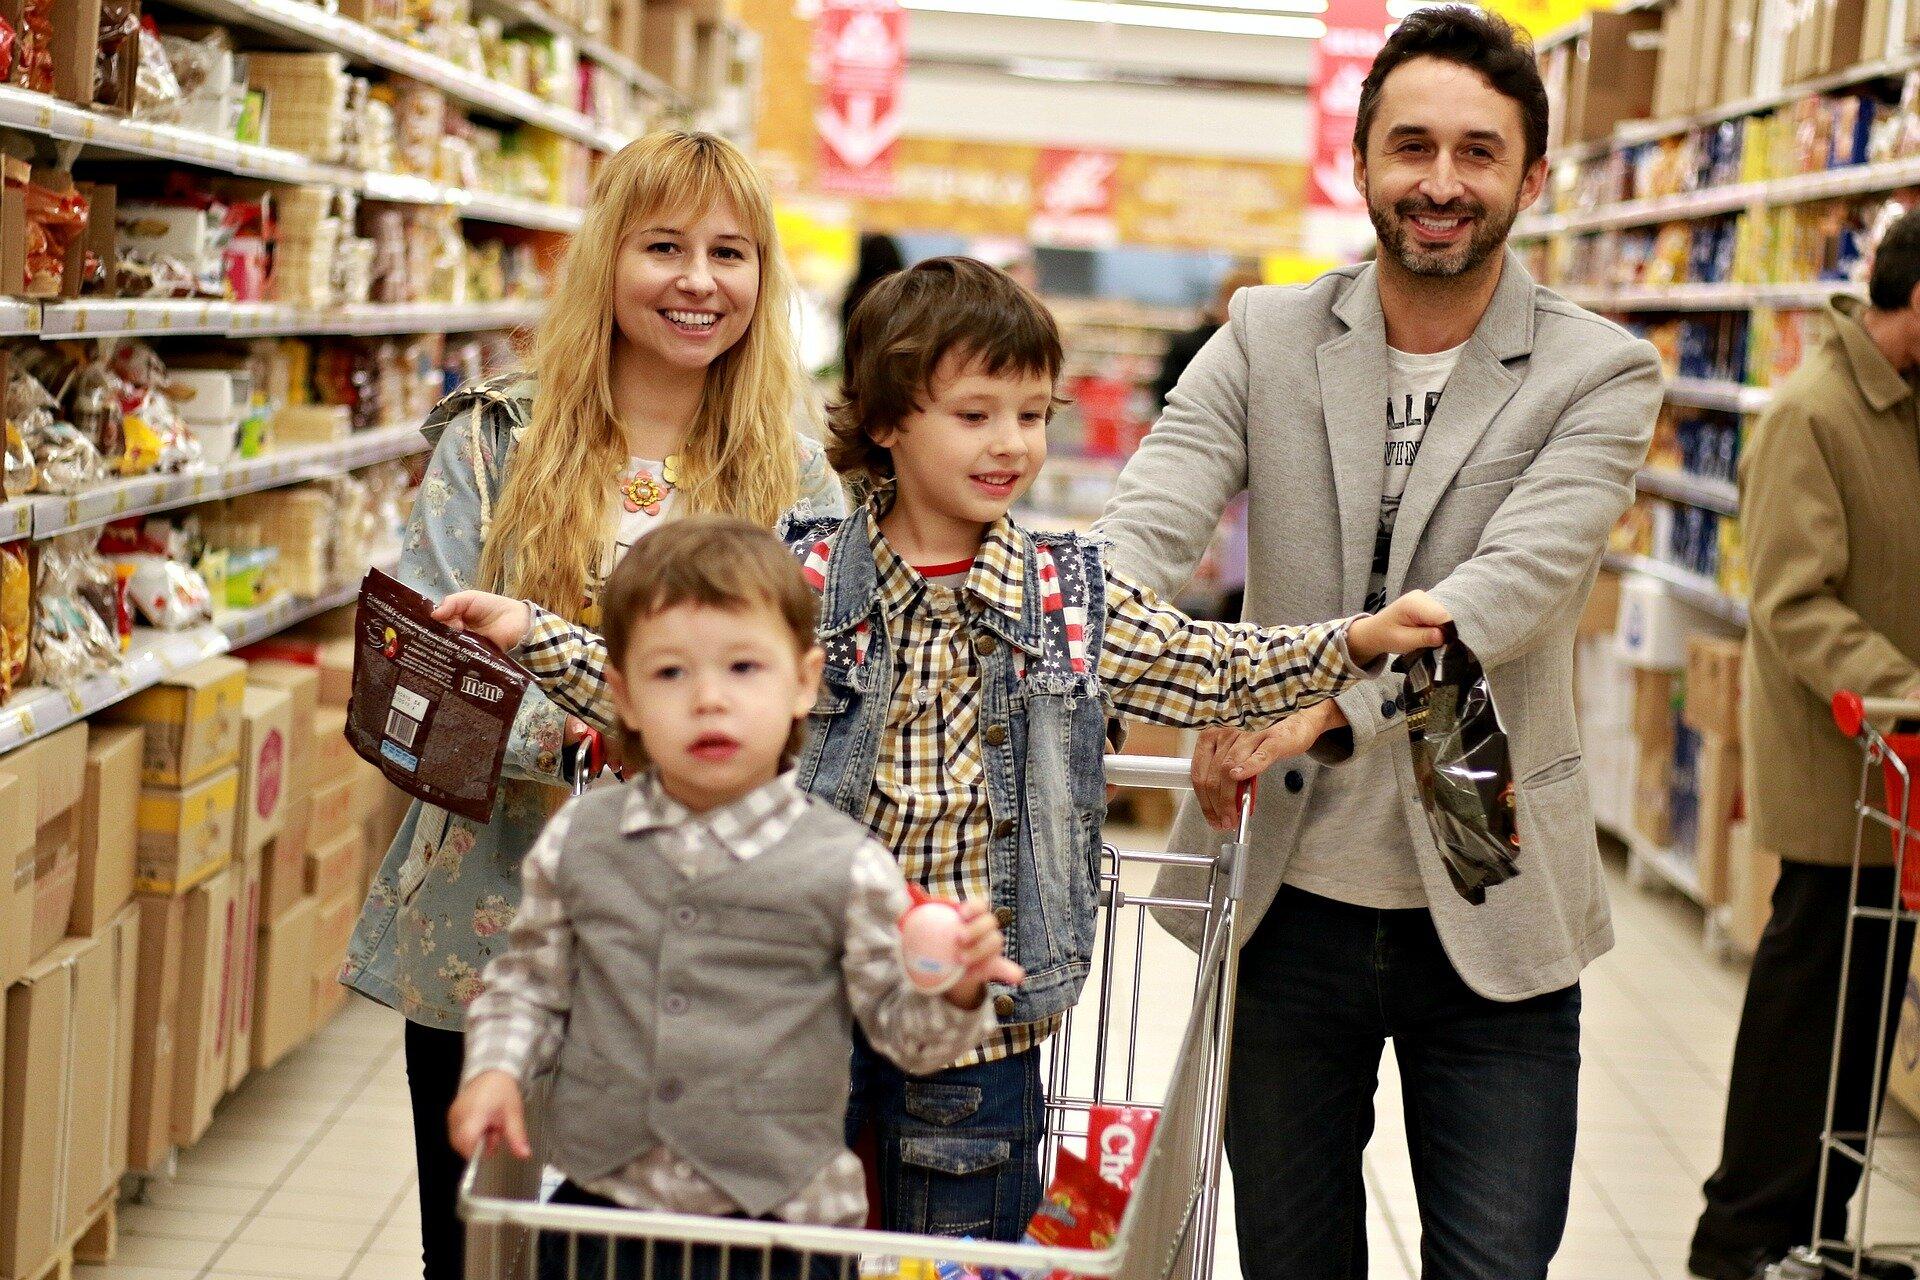 Photo By: Victoria Borodinova   Parents and Kids in Shopping Mall